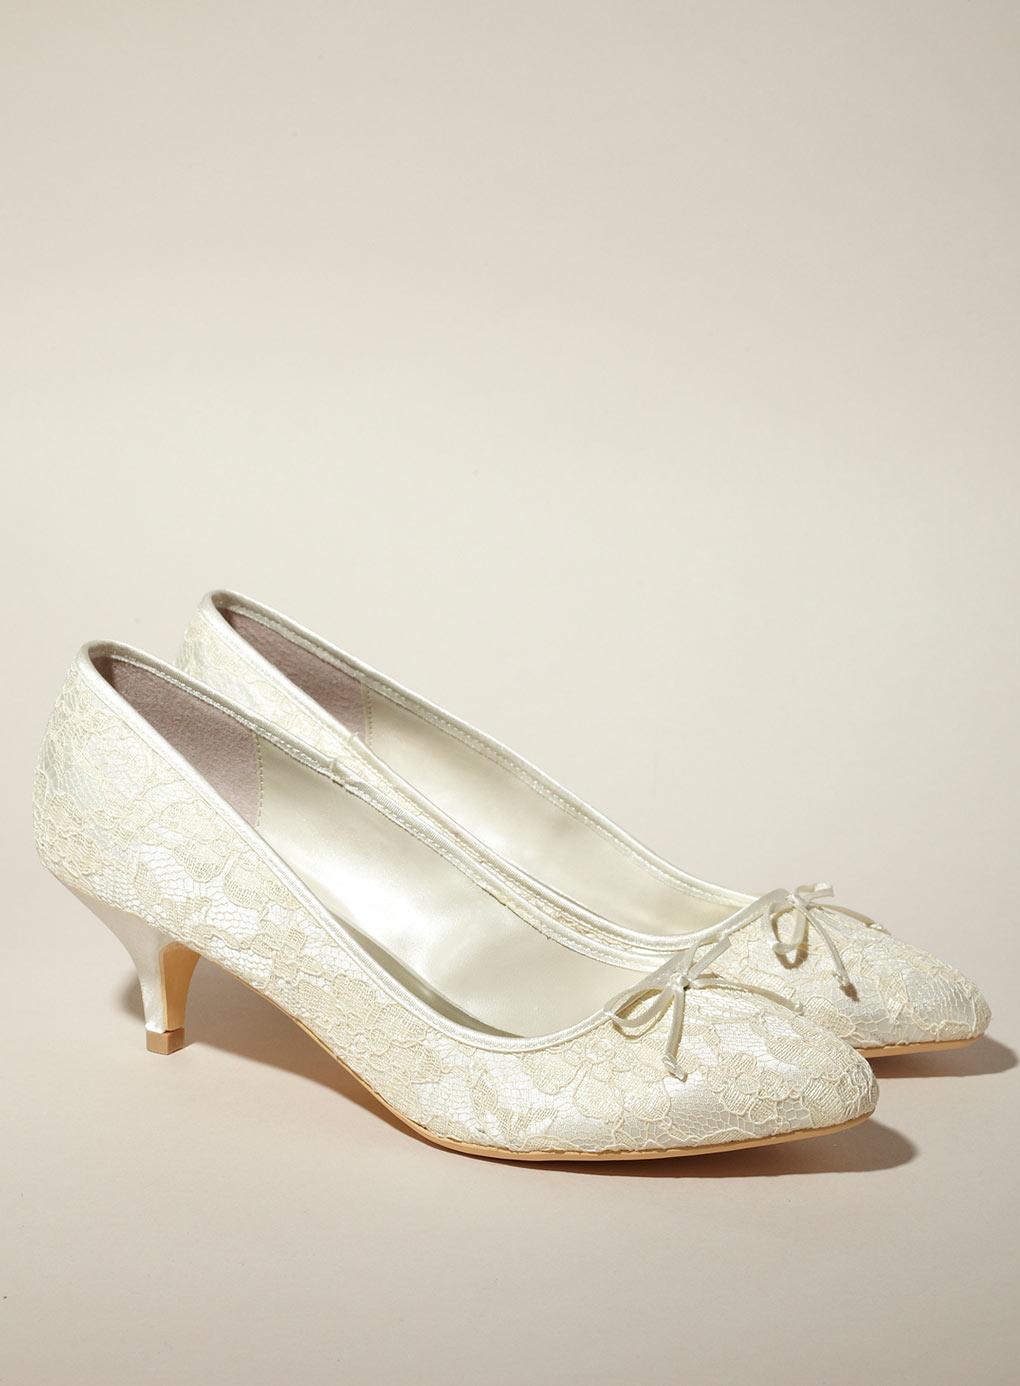 black wedding shoes low heel photo - 1